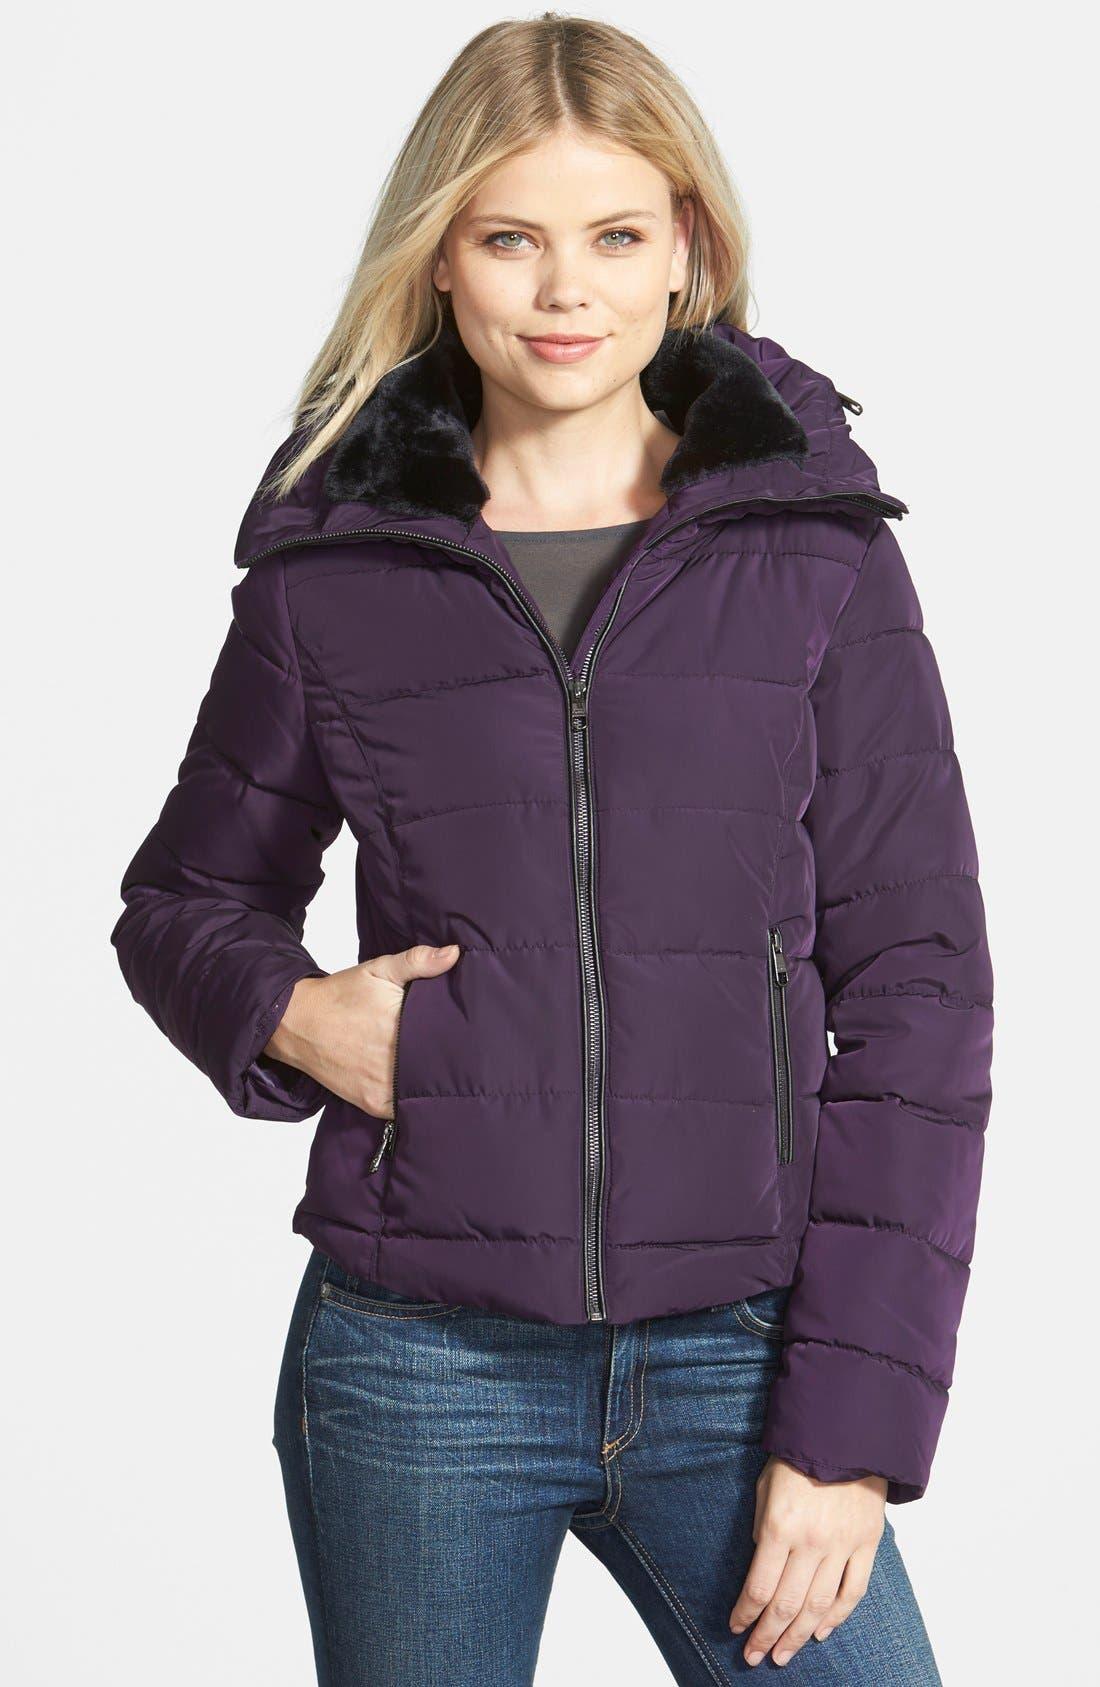 Alternate Image 1 Selected - Steve Madden Faux Fur Collar Puffer Jacket